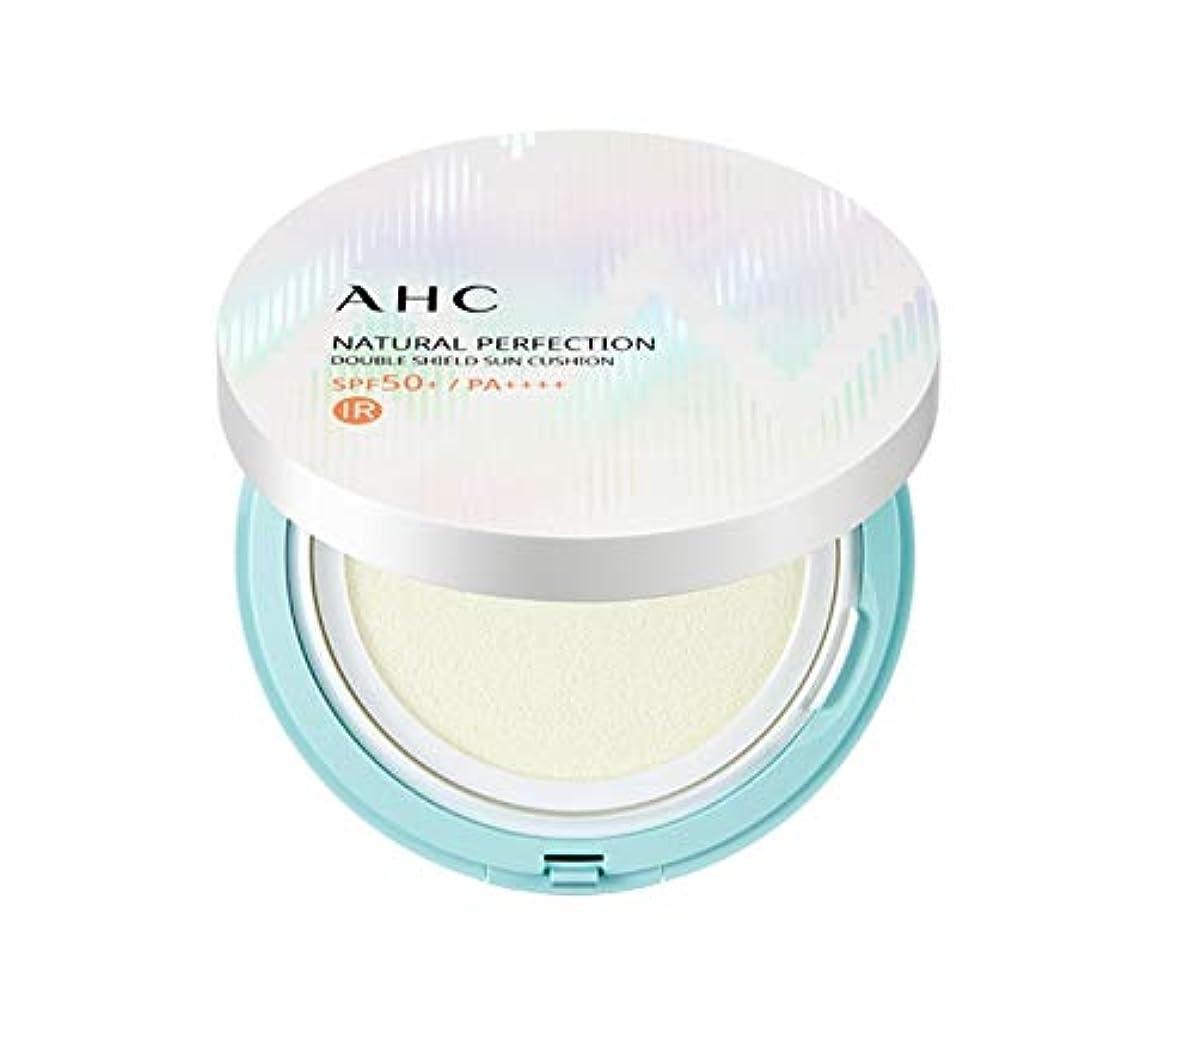 AHC ナチュラルパーフェクションダブルシールド線クッション ホワイト 25g / AHC NATURAL PERFECTION DOUBLE SHIELD SUN CUSHION WHITE [並行輸入品]